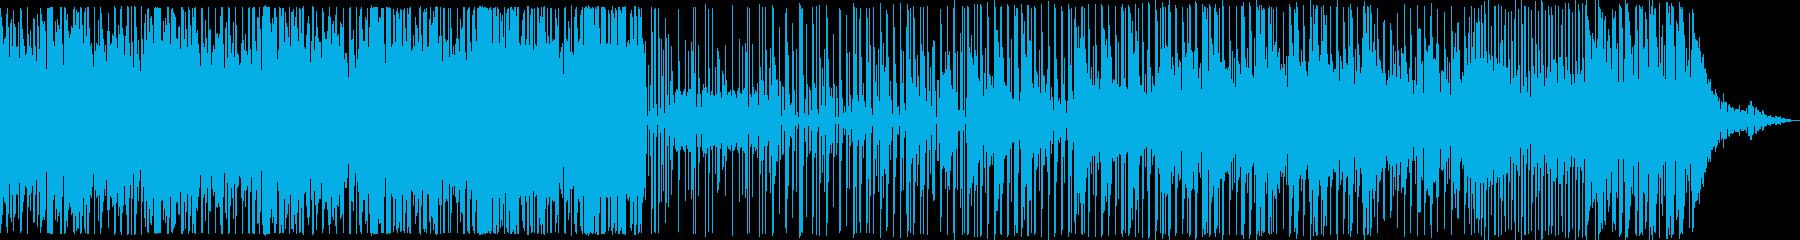 chill_mix_2.0の再生済みの波形